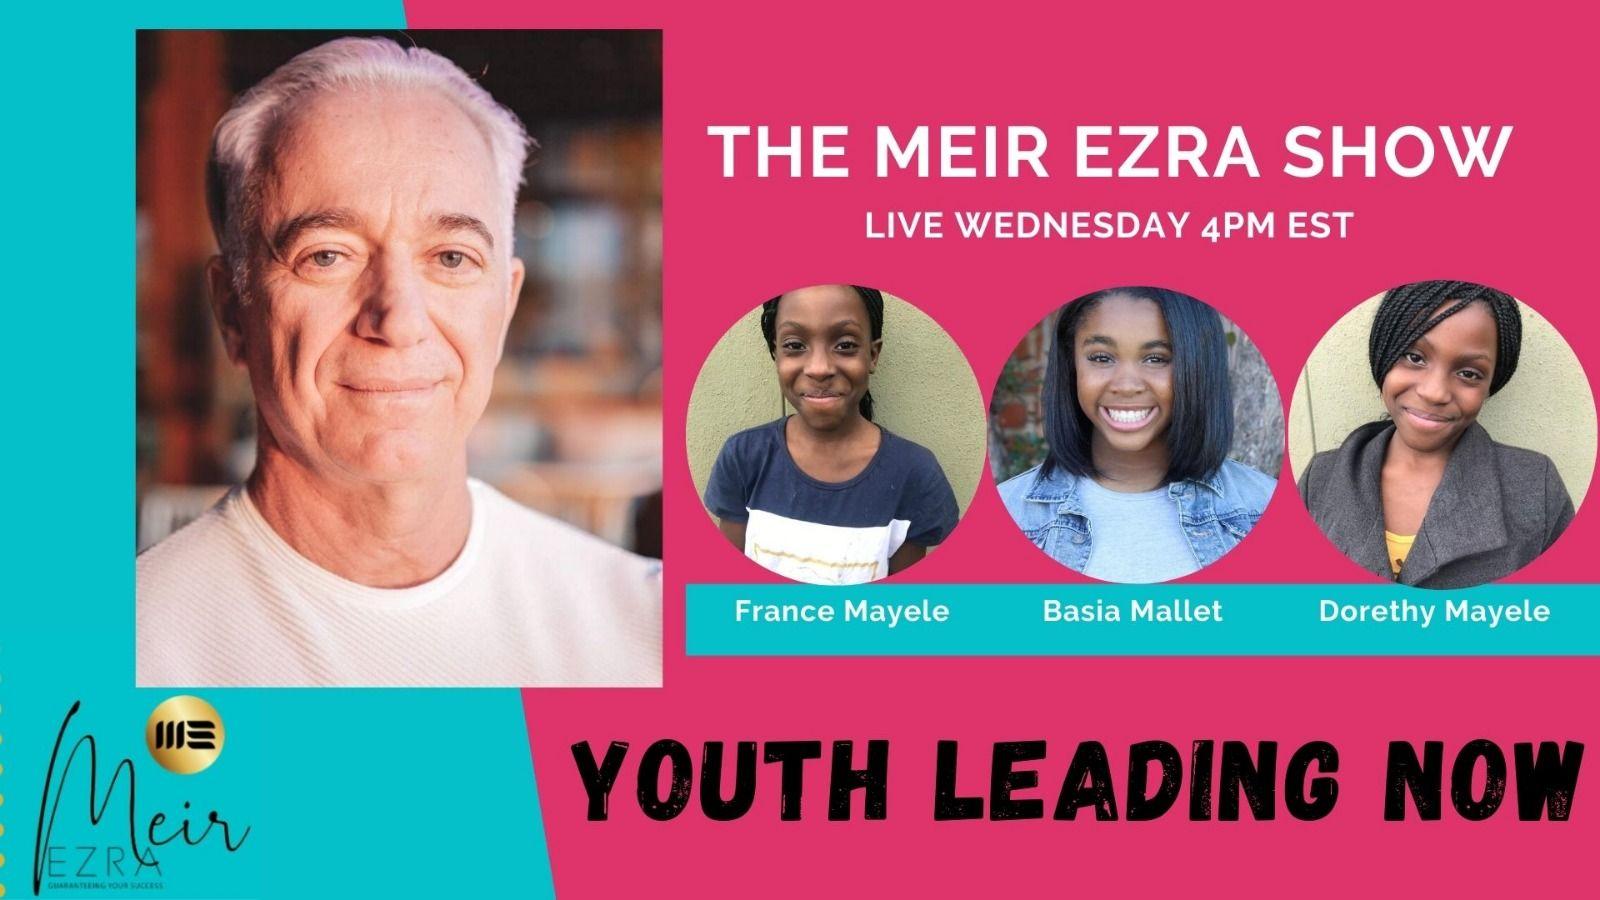 Meir ezra show youth leading now in 2020 gotowebinar